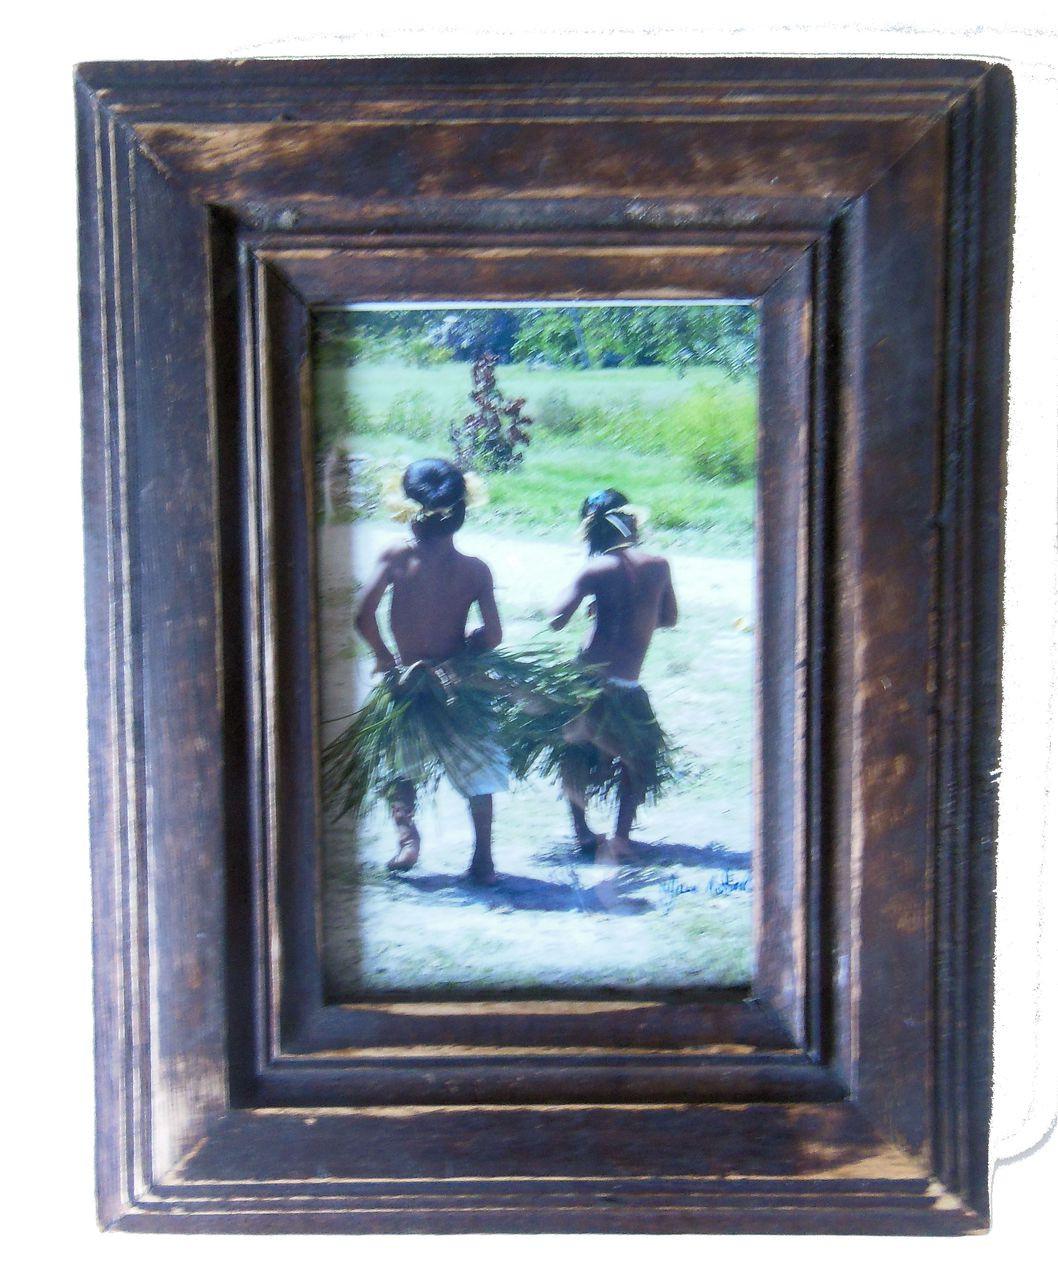 Little Dancers.  Fanning Island framed and signed photo.